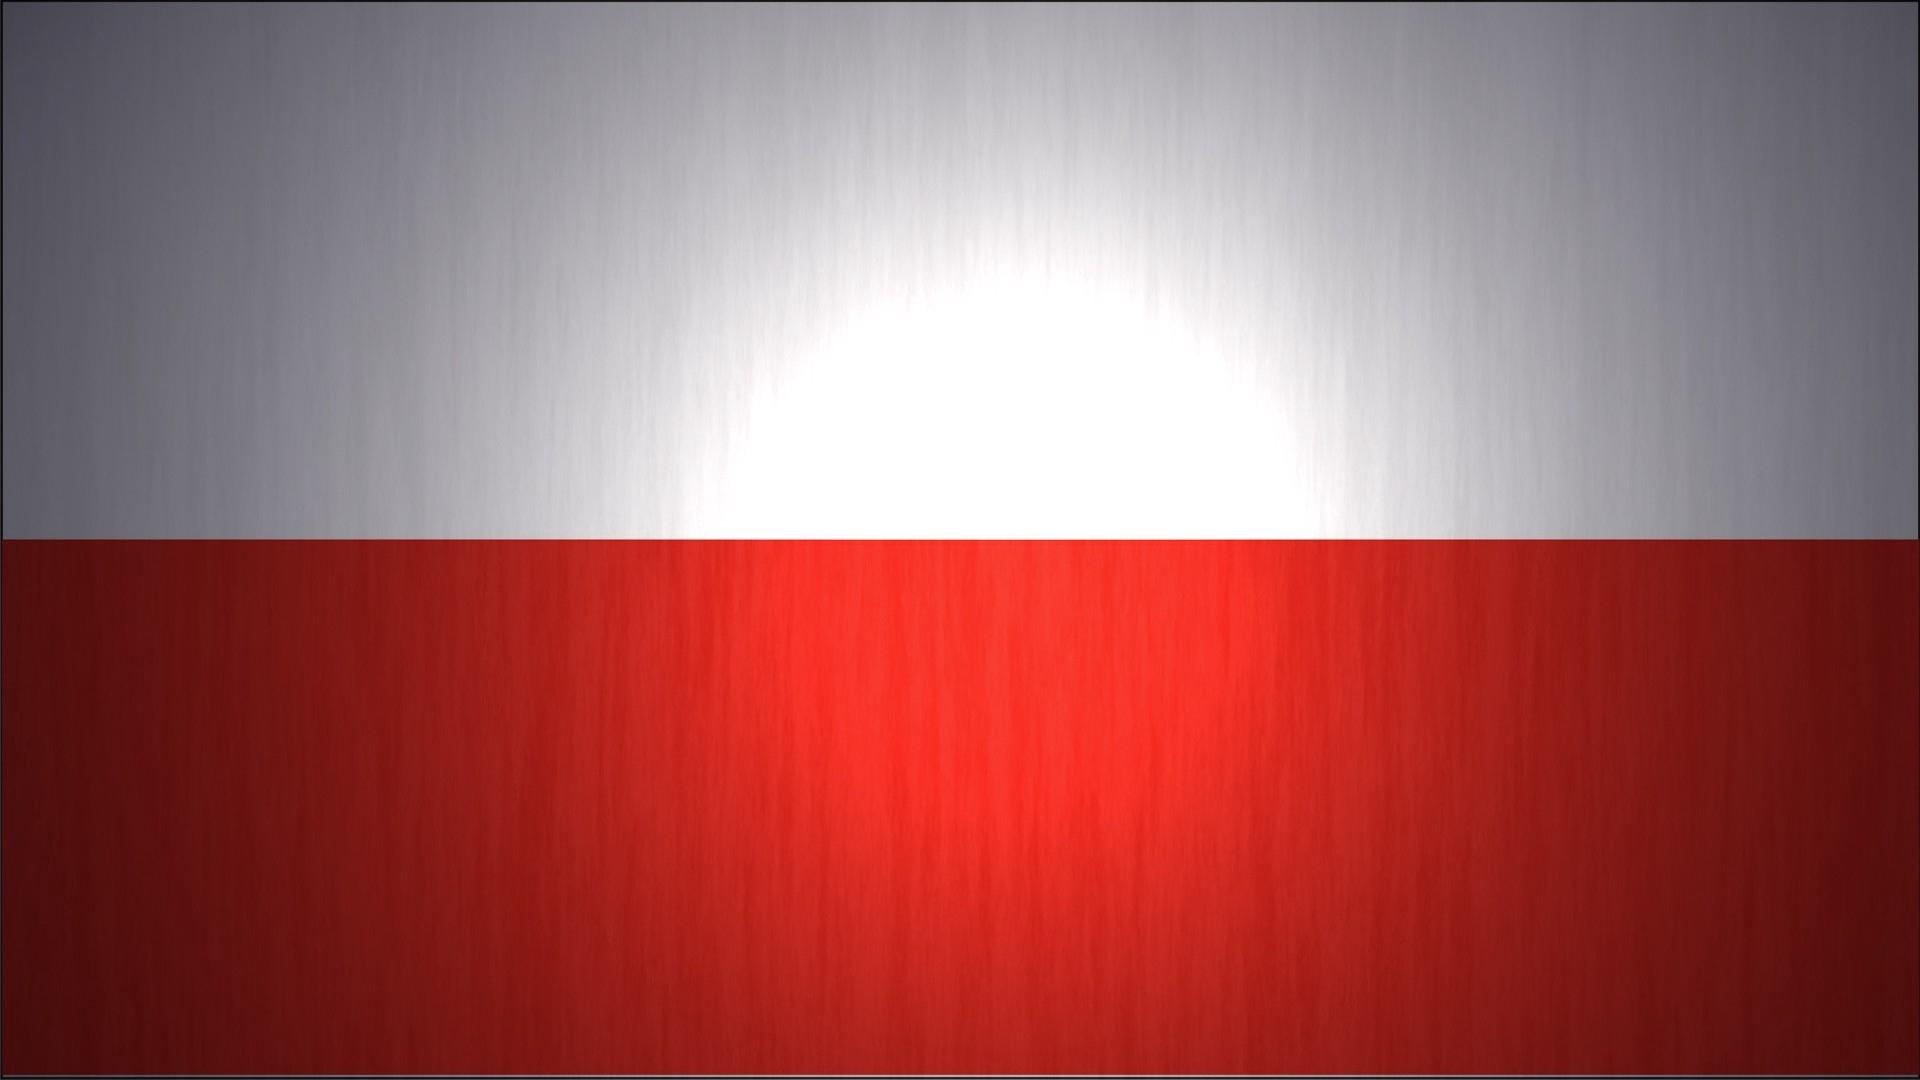 Poland Flag Symbol Texture   Stock Photos Images HD 1920x1080